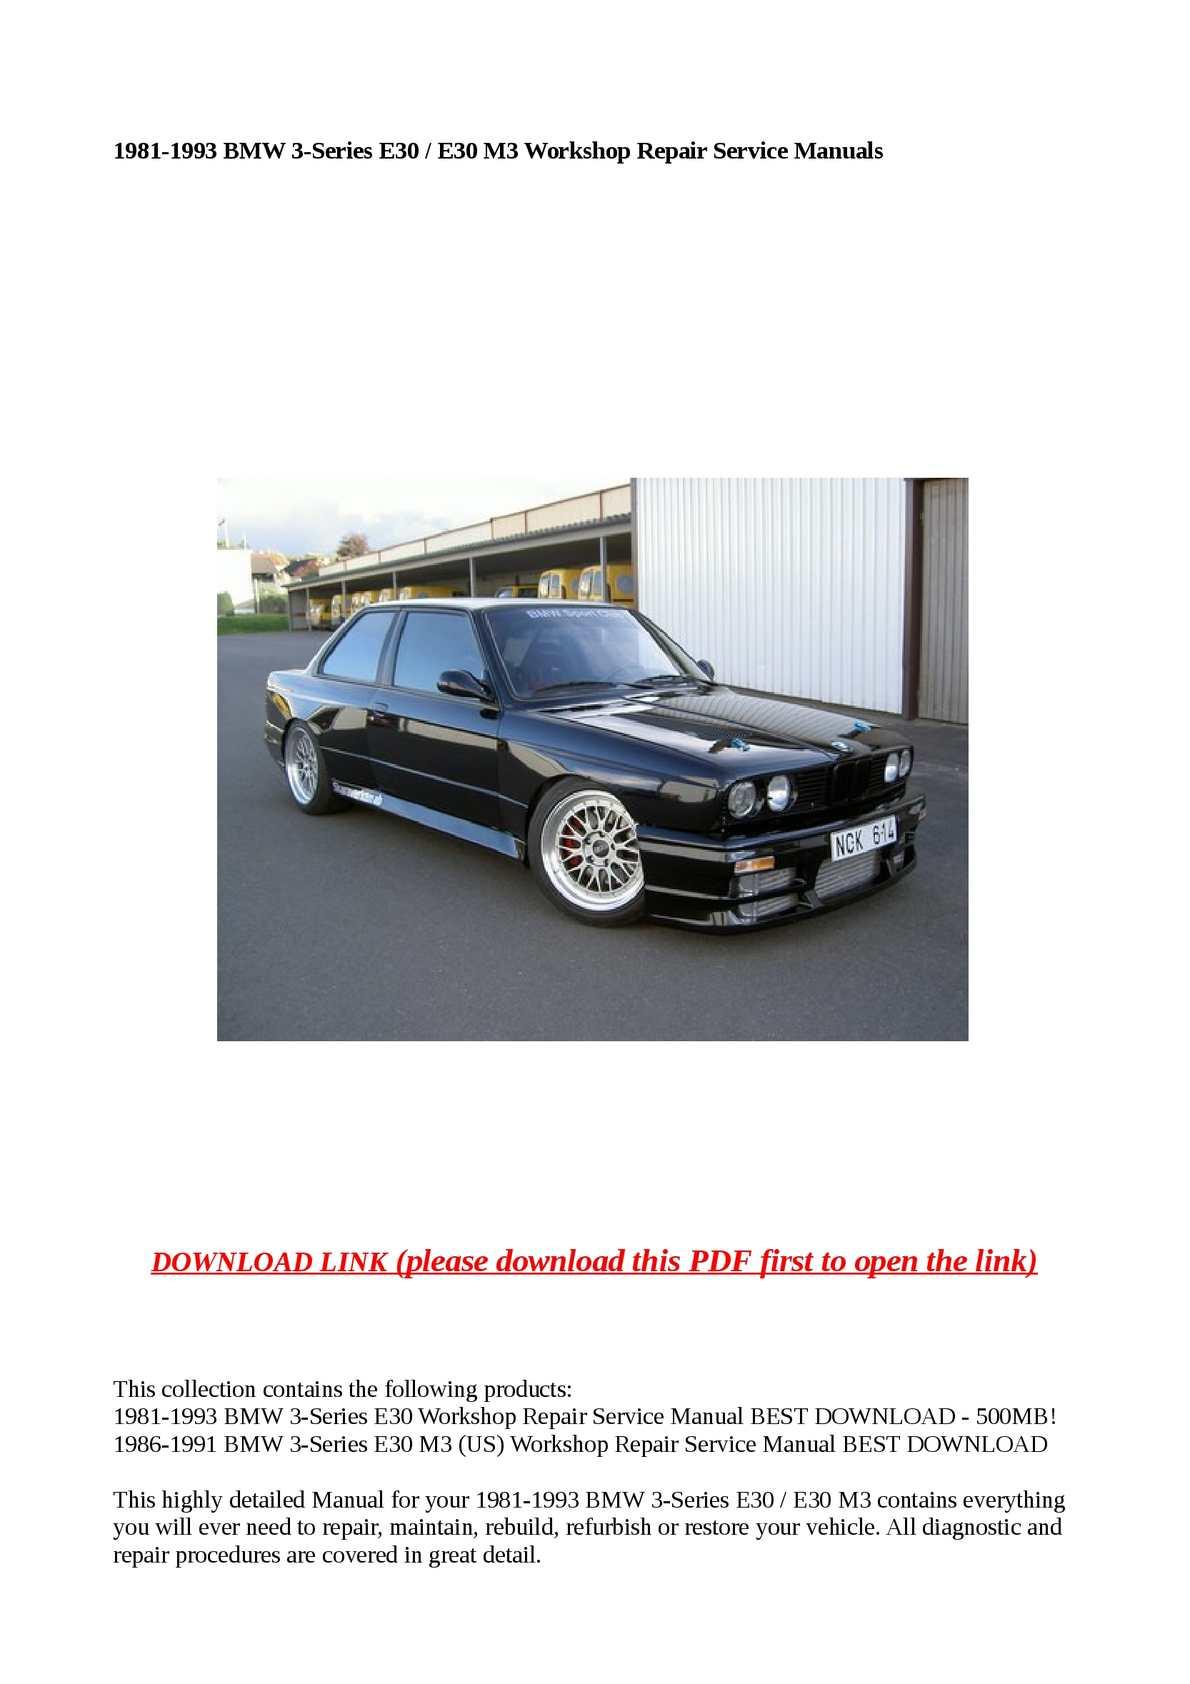 Haynes Manual Bmw 3 Series Download Pdf